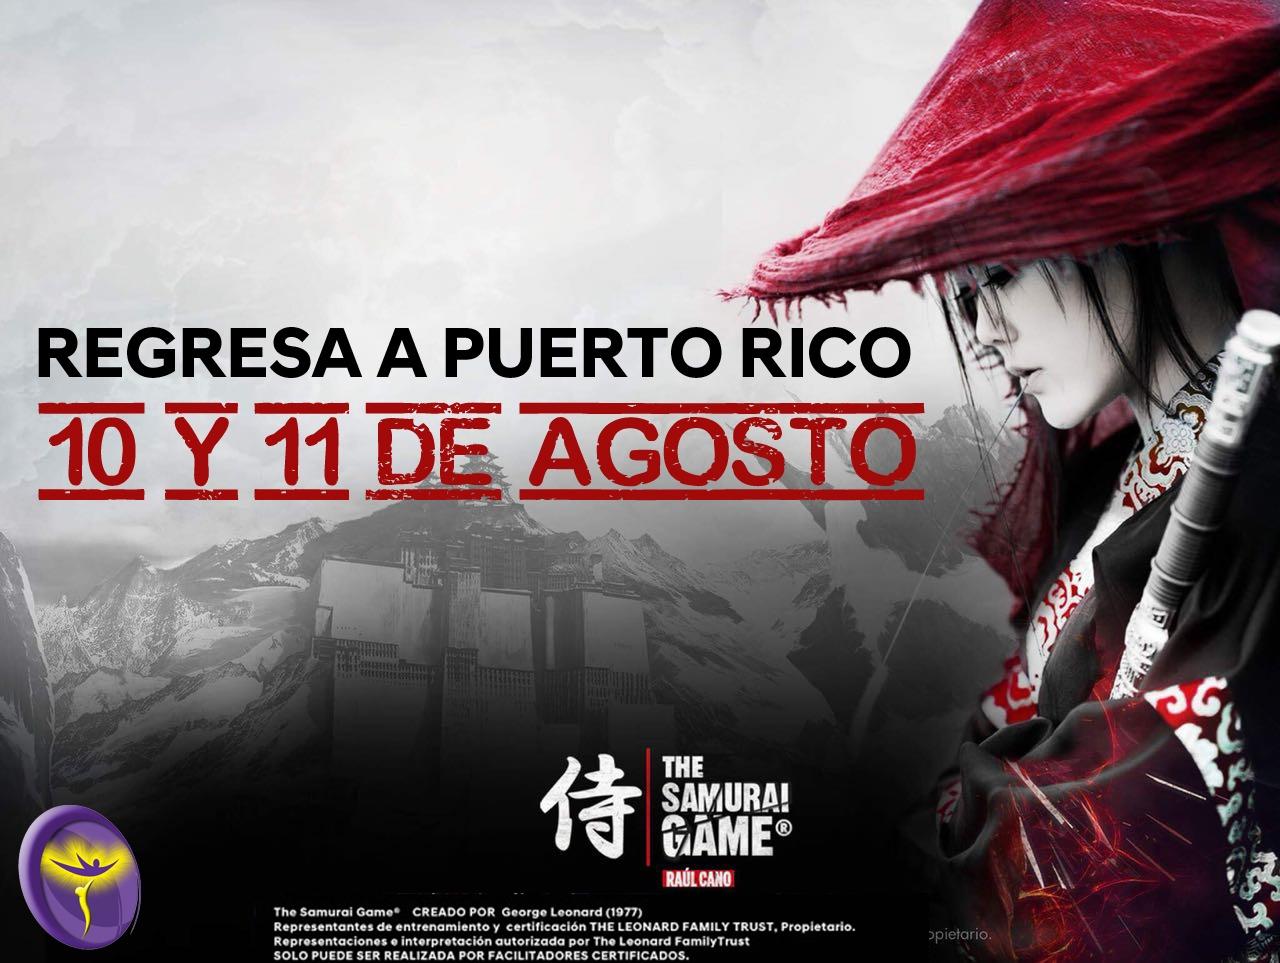 The Samurai Game®️ Puerto Rico, Raul Cano (SIM)